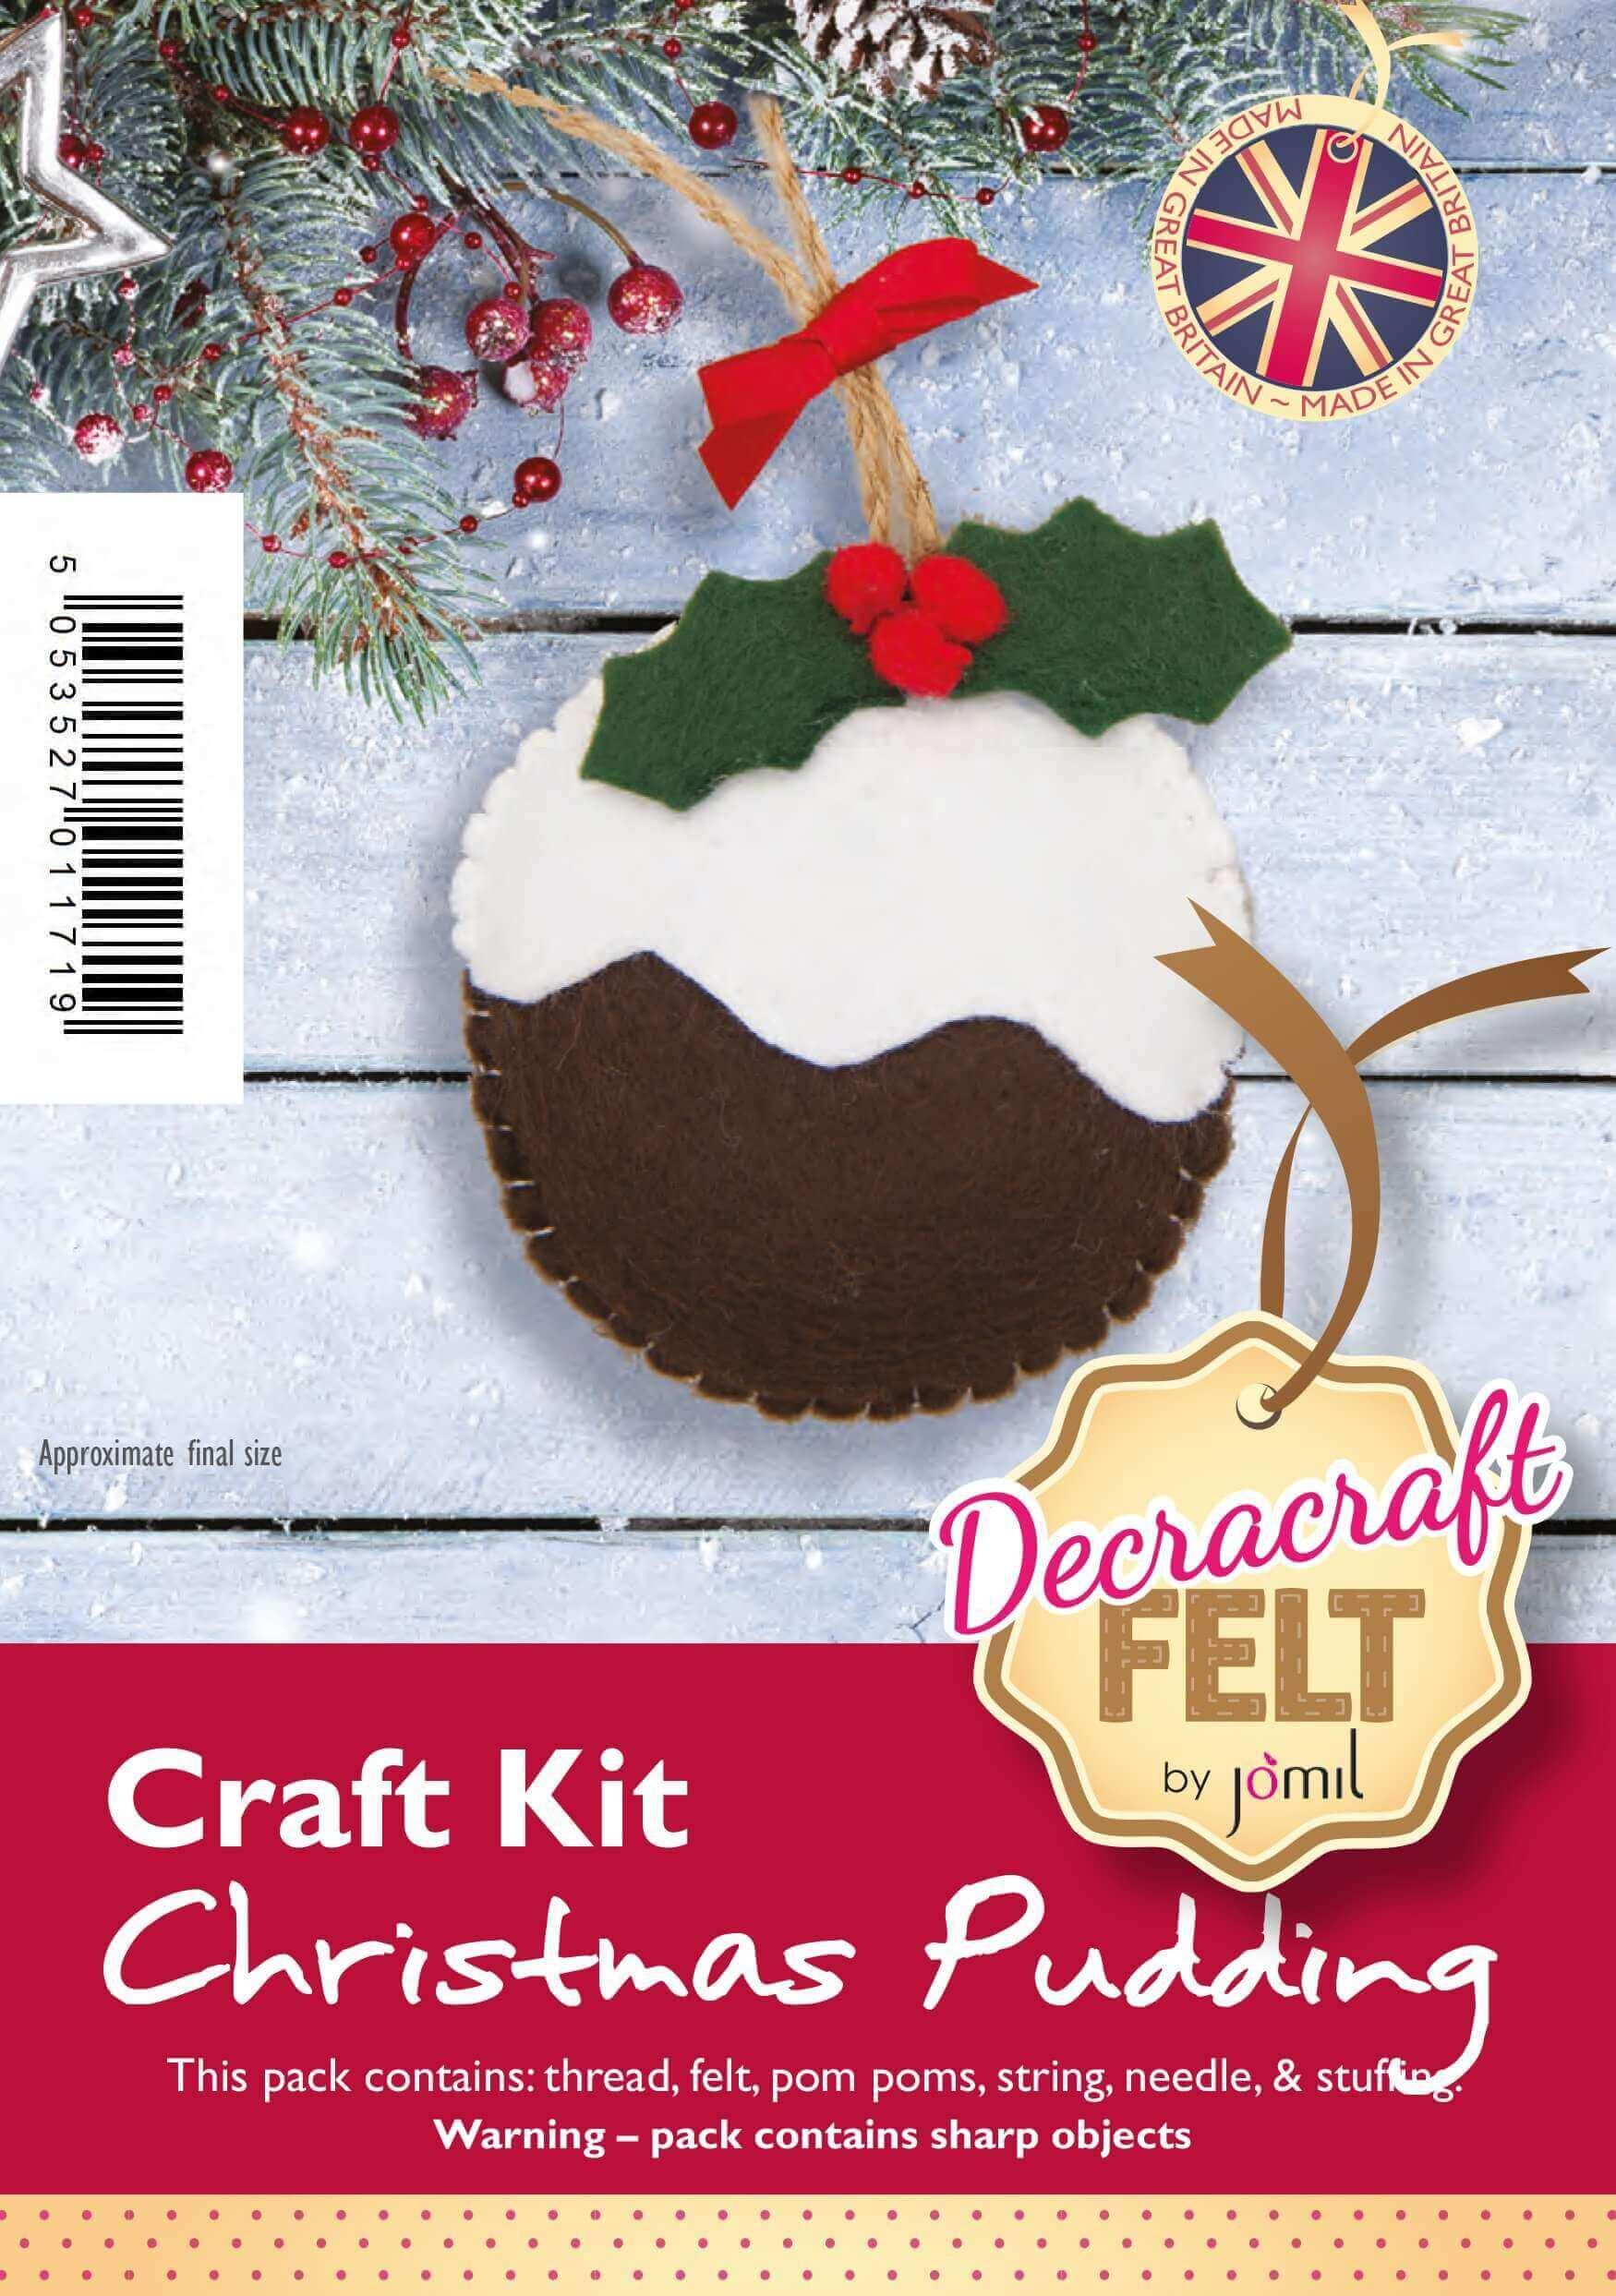 Felt Christmas Decorations Uk.Fk11 Decracraft Felt Christmas Pudding Kit 3 Pieces